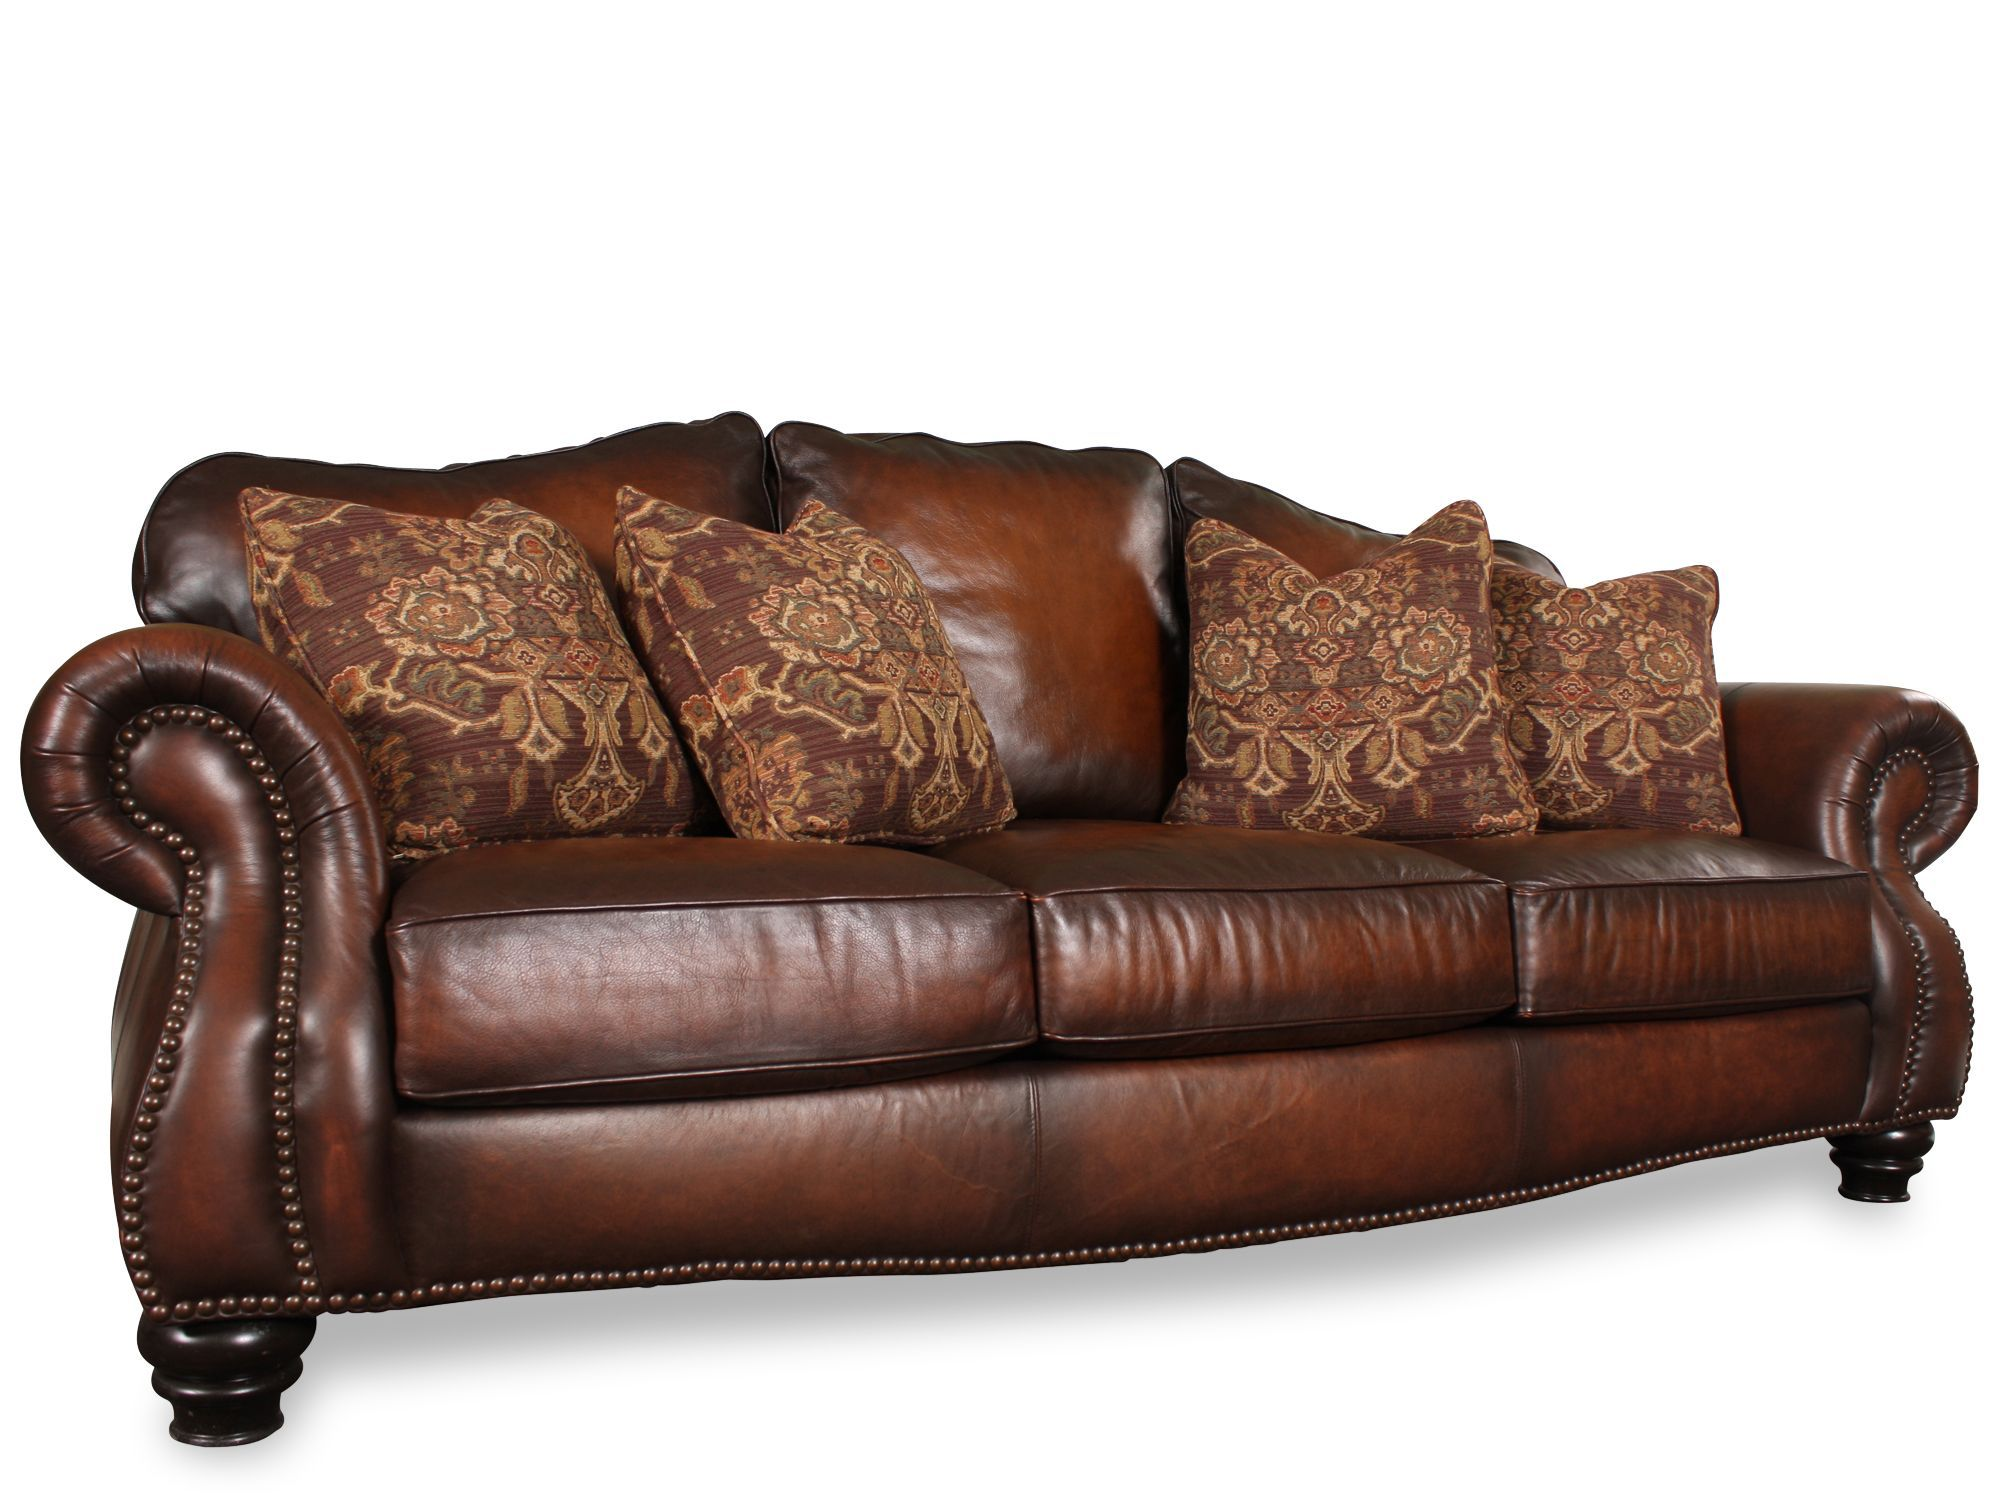 Bernhardt Chad Leather Sofa | For the Home | Pinterest | Bernhardt ...